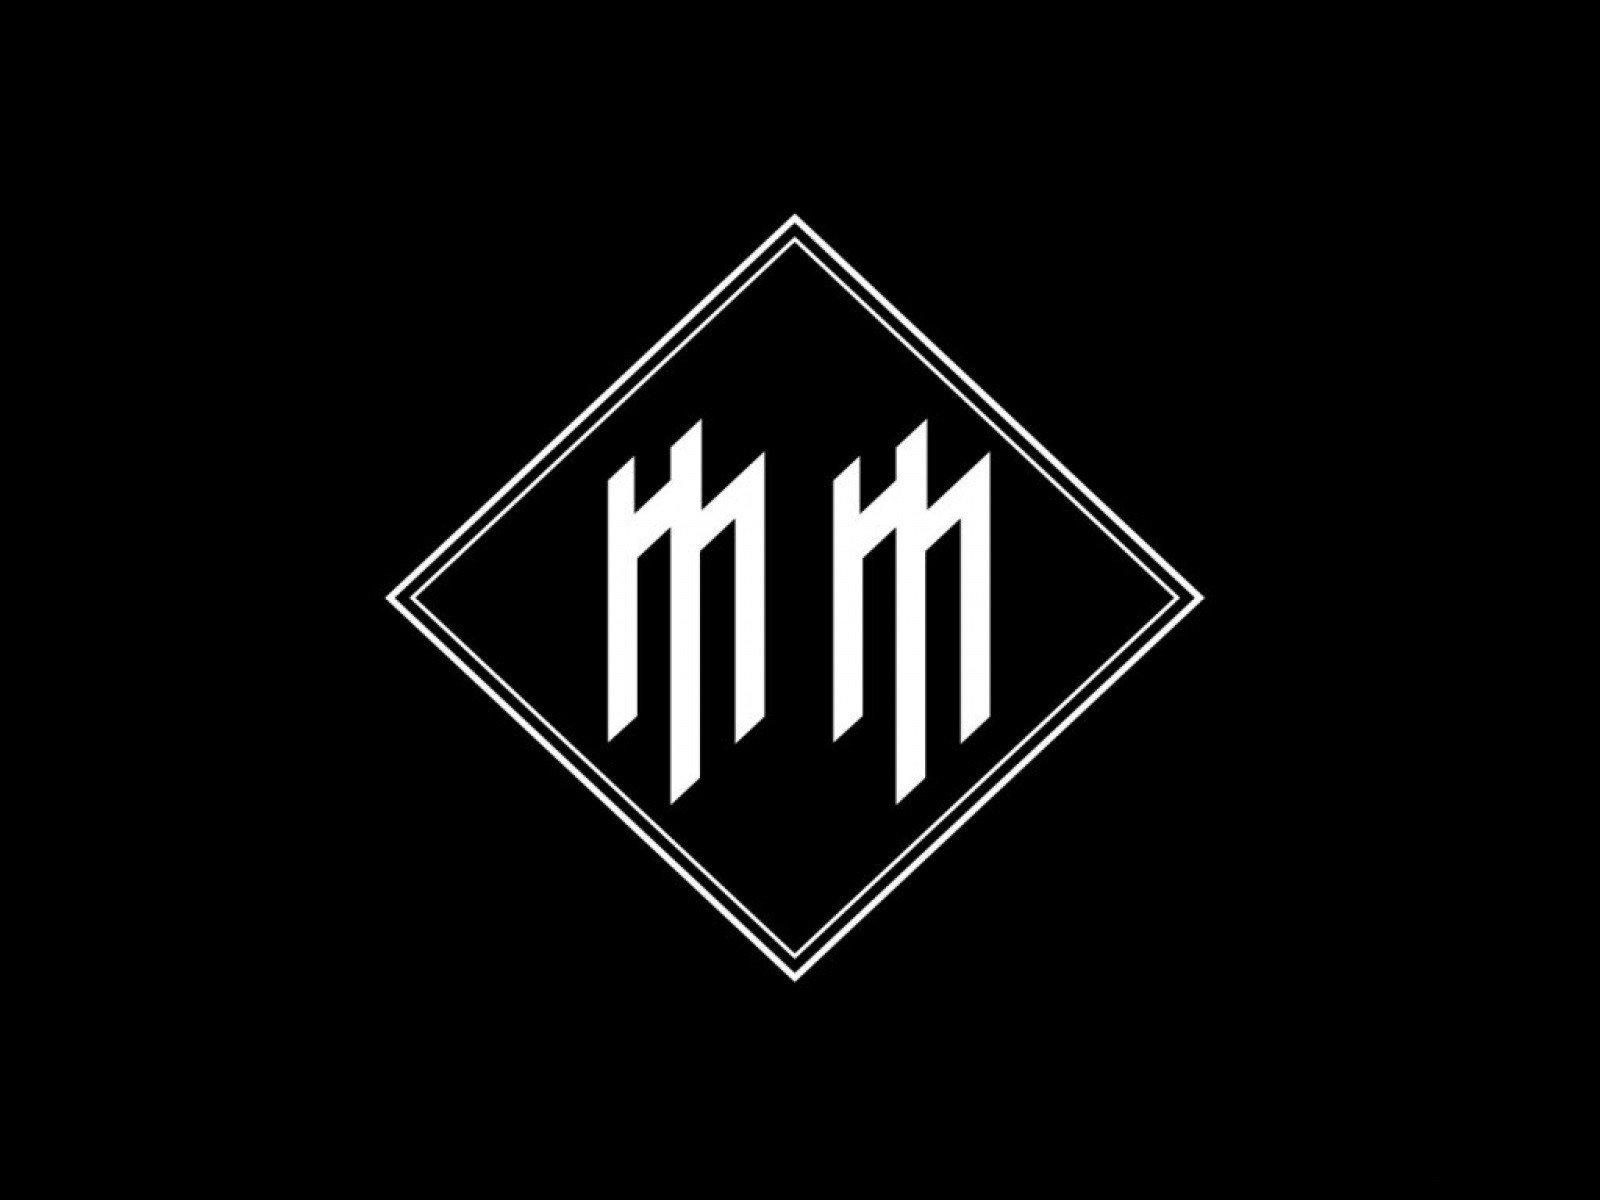 Wallpaper 1600x1200 Px Black Background Logo Marilyn Manson